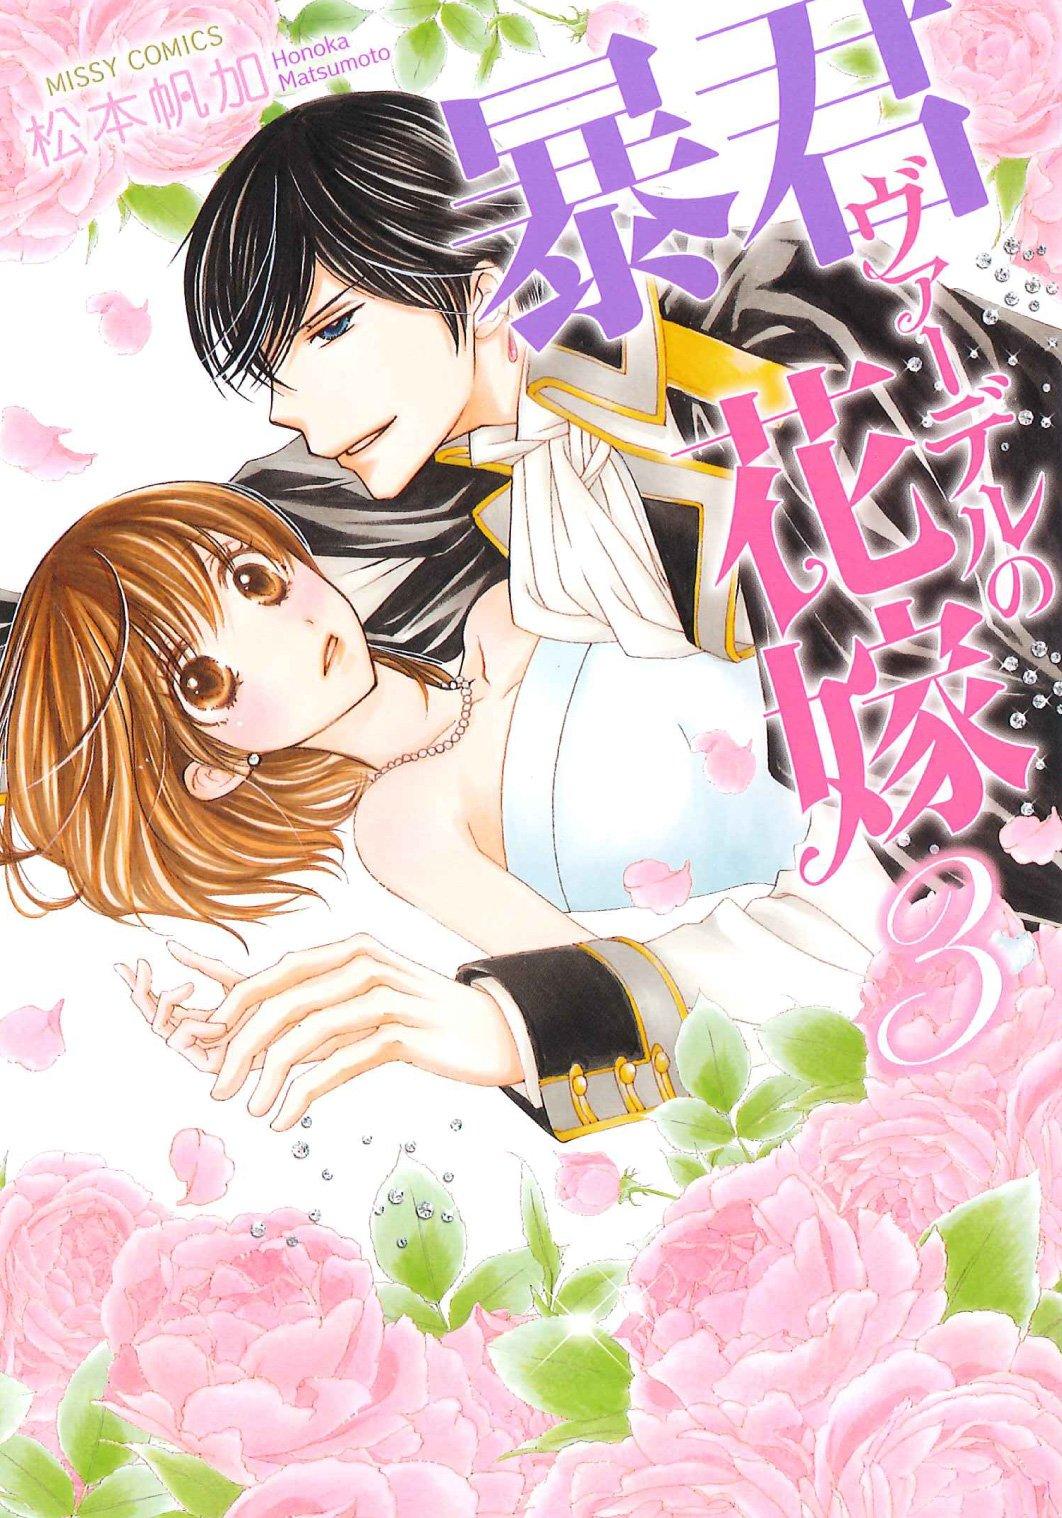 Download 暴君ヴァーデルの花嫁 3 (ミッシイコミックス Next comics F) pdf